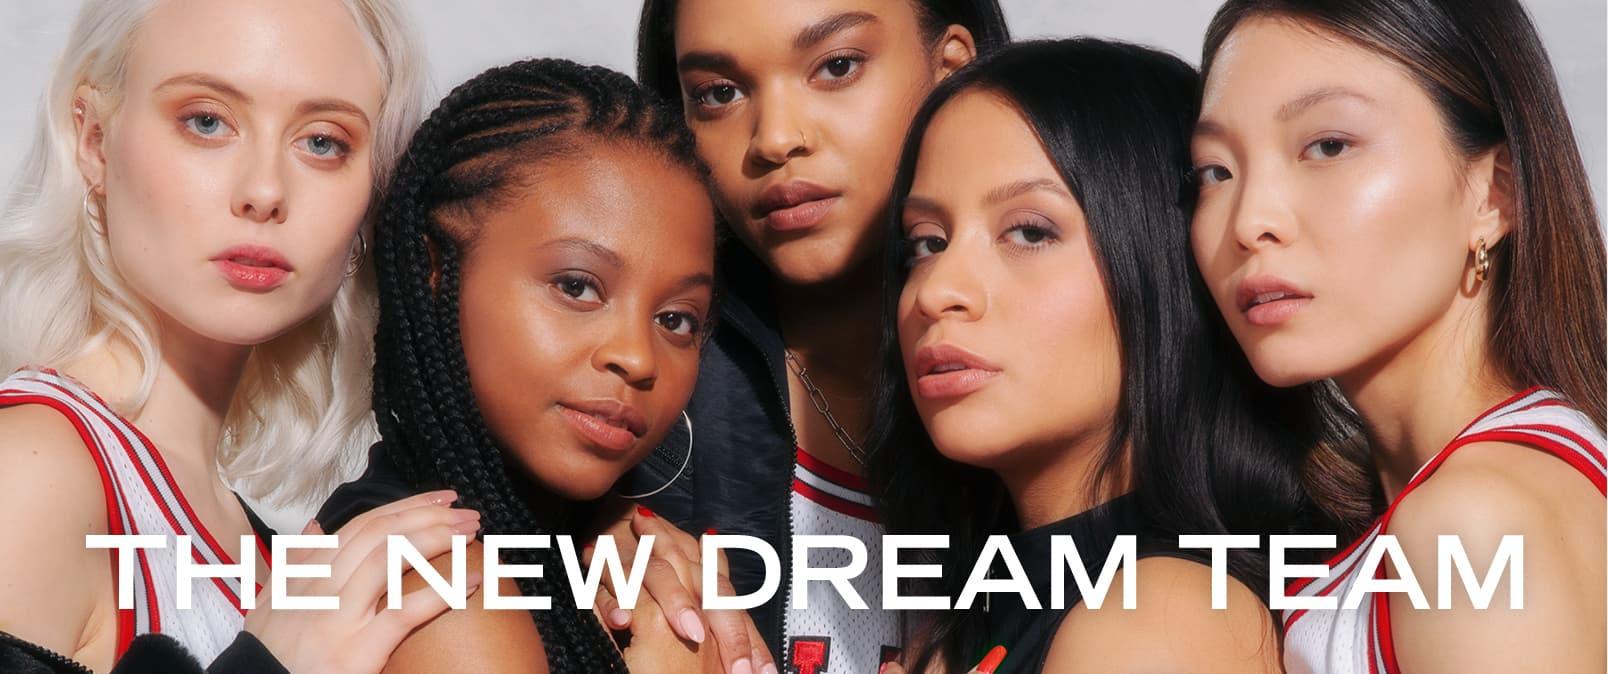 Nordstrom + NIKE Ad. Makeup by Fine Makeup ARt & Associates